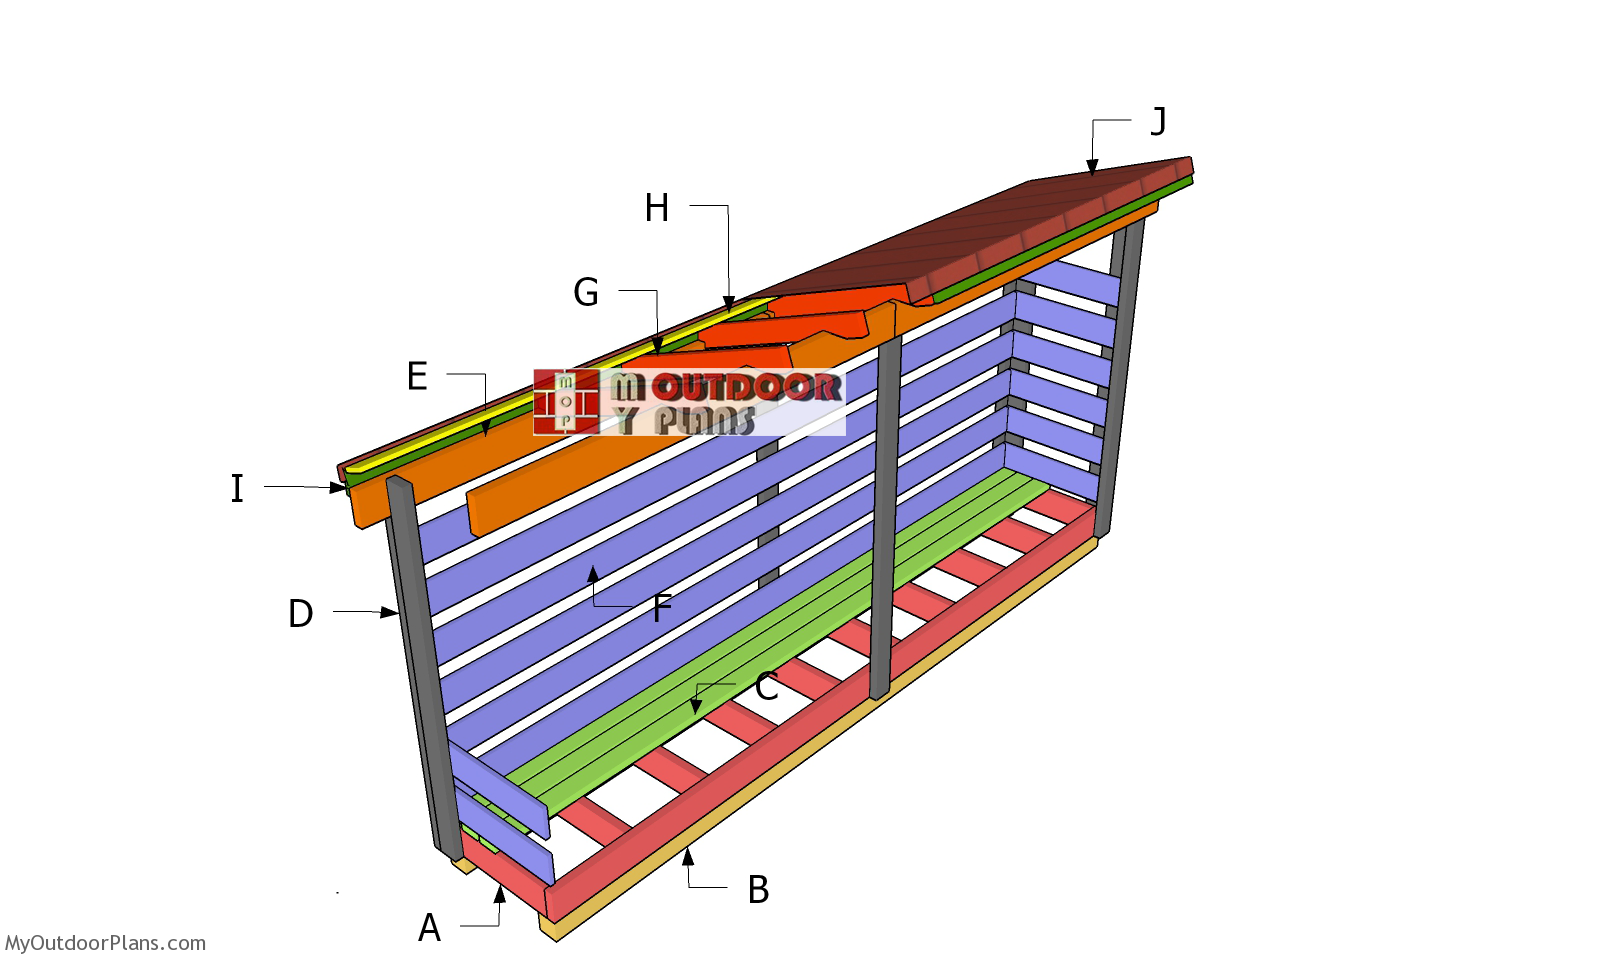 3x10 Wood Storage Shed Plans - Part 2